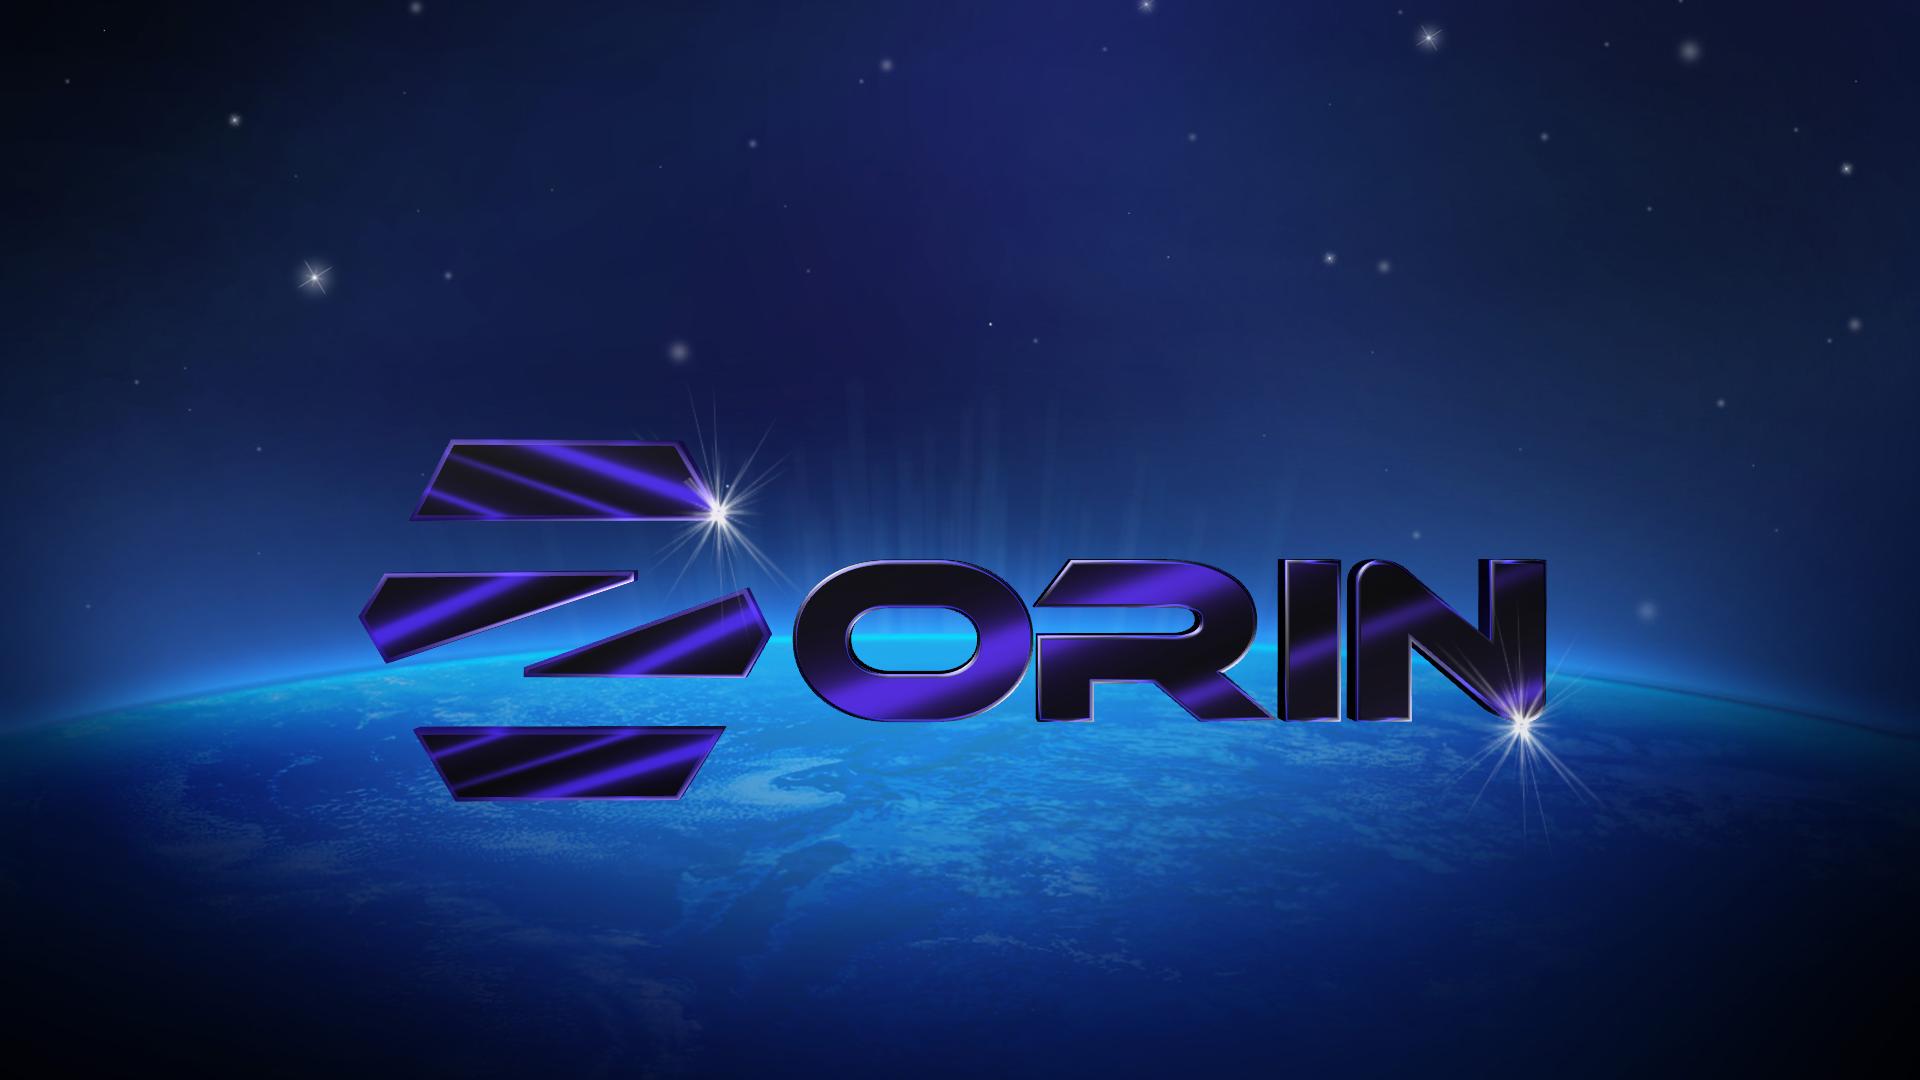 Zorin Wallpaper